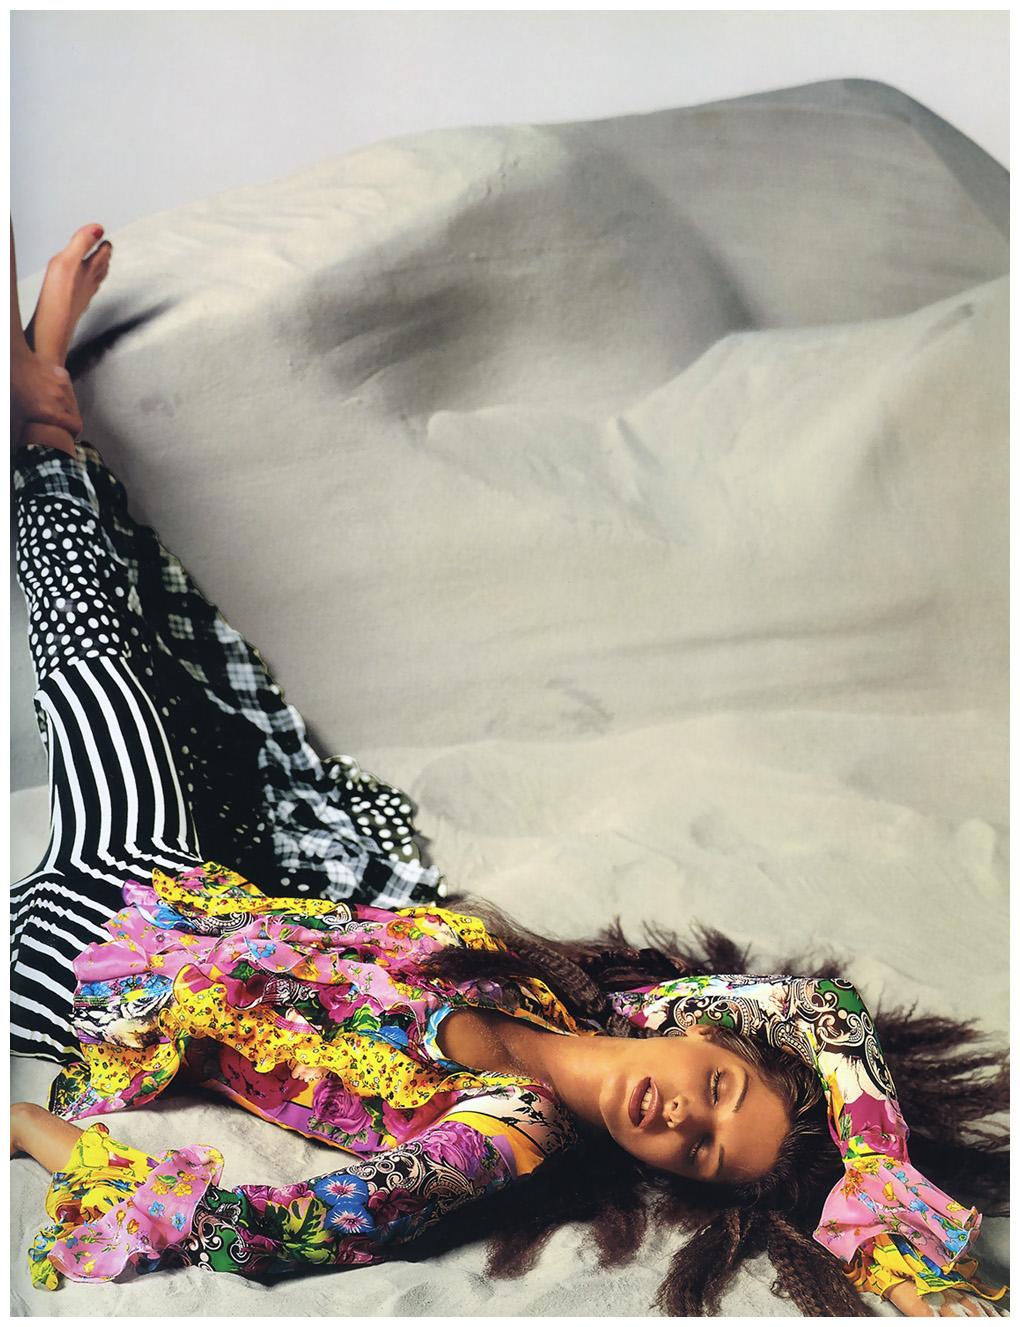 stephanie-seymour-versace-spring-1993-richard-avedon